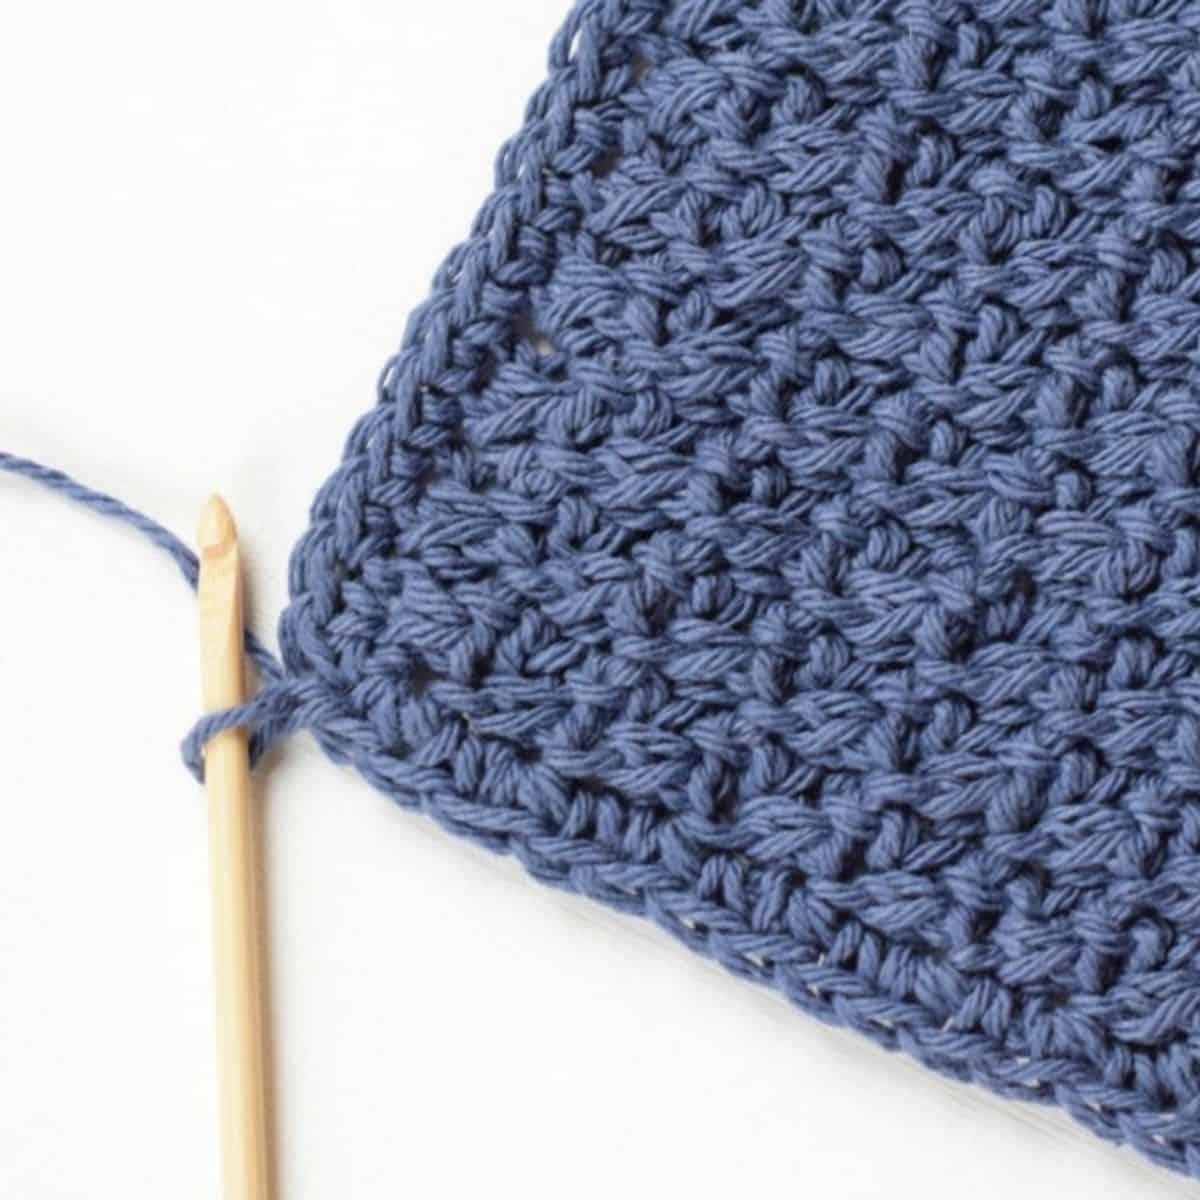 corner of a washcloth crocheted